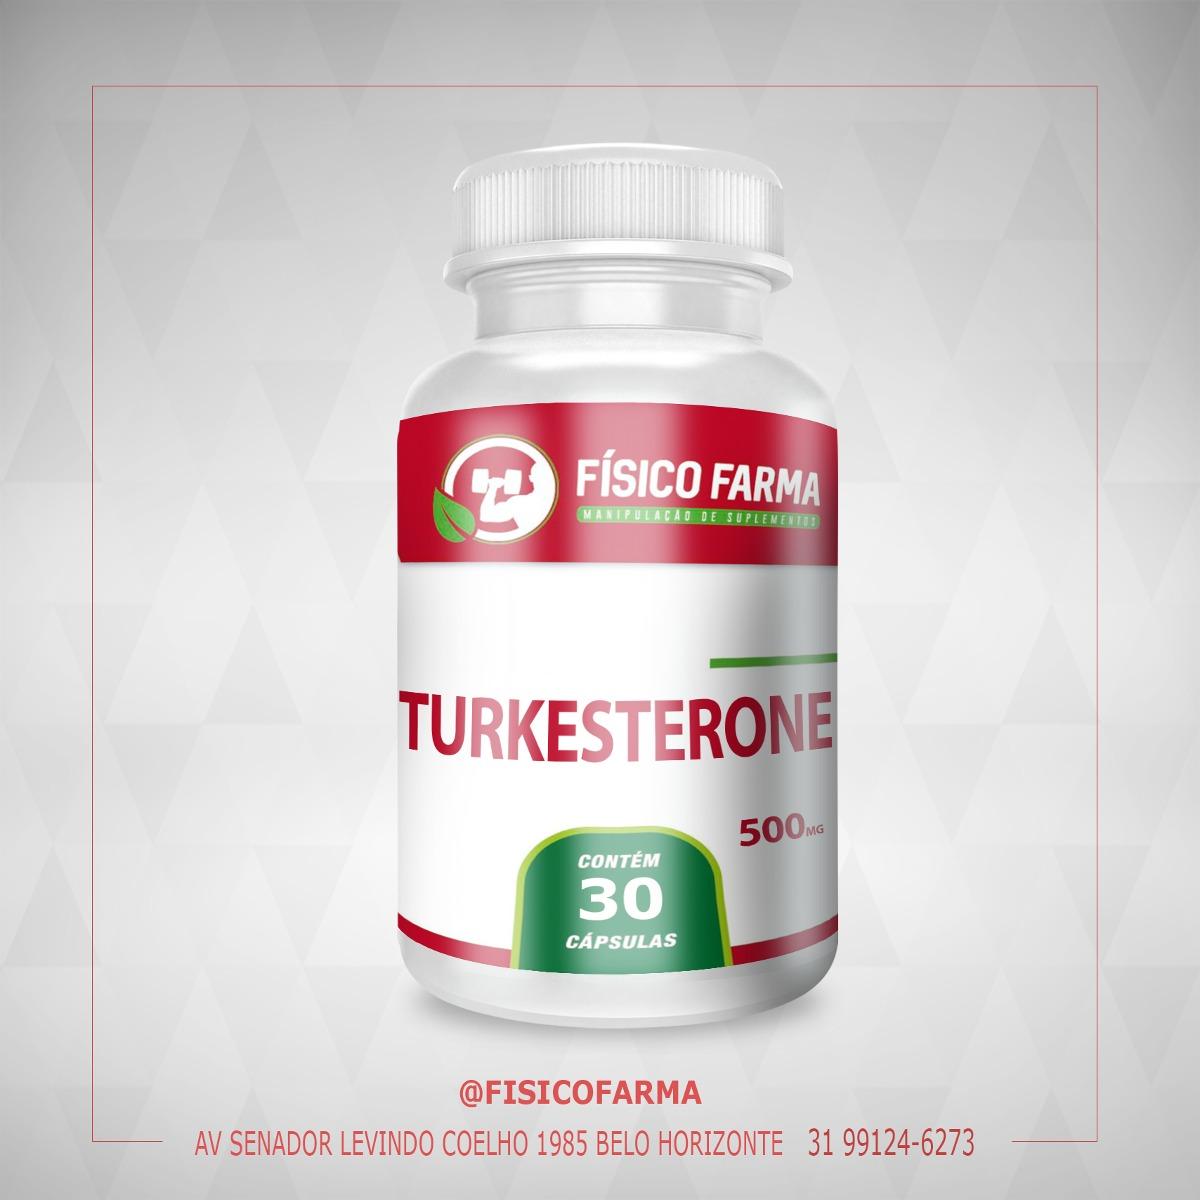 Turkesterone 500MG - 30 CÁPSULÁS